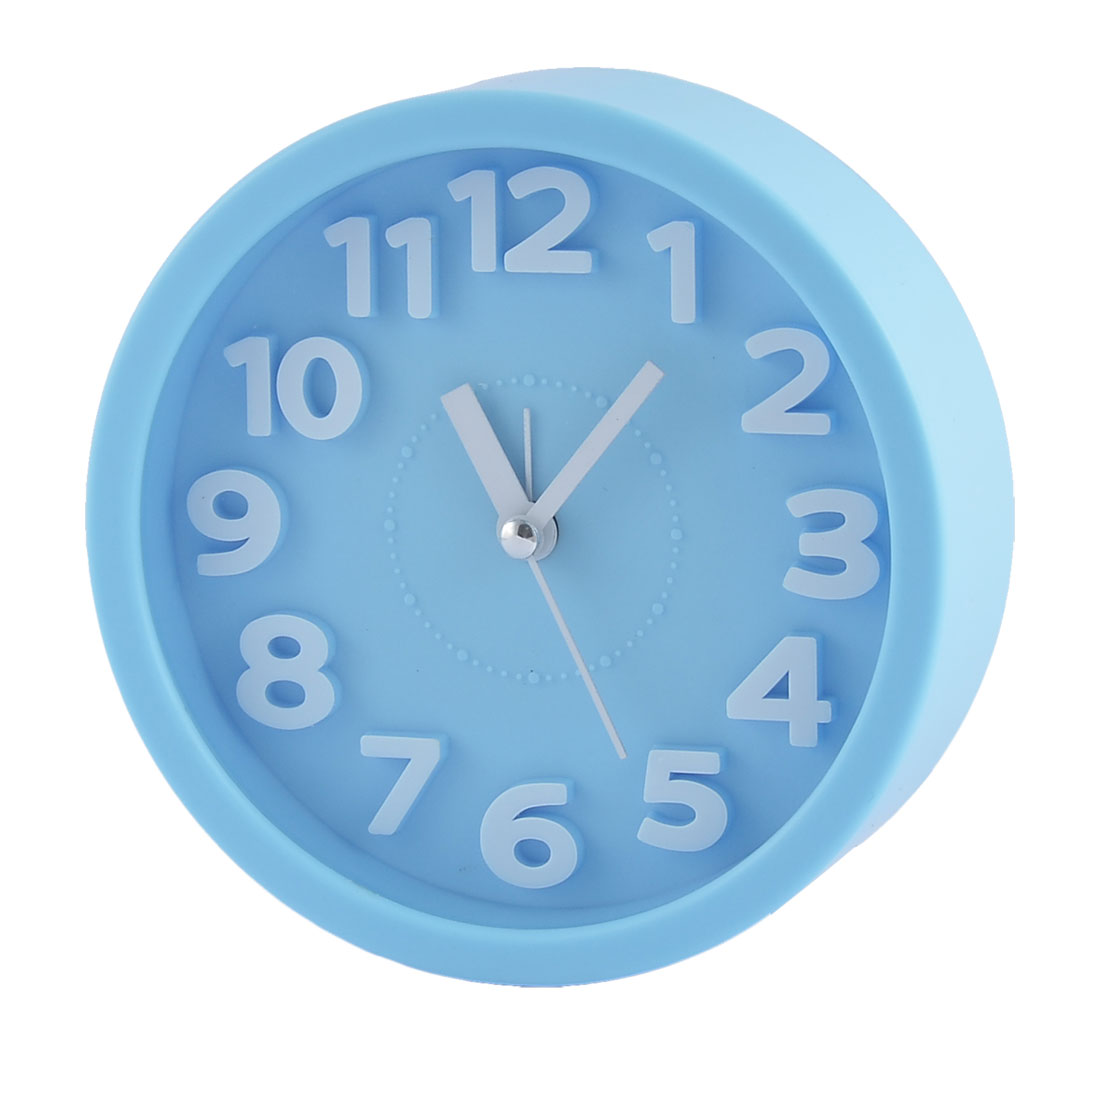 Household Office Desktop Plastic Round Silent Battery Powered Arabic Number Alarm Clock Blue